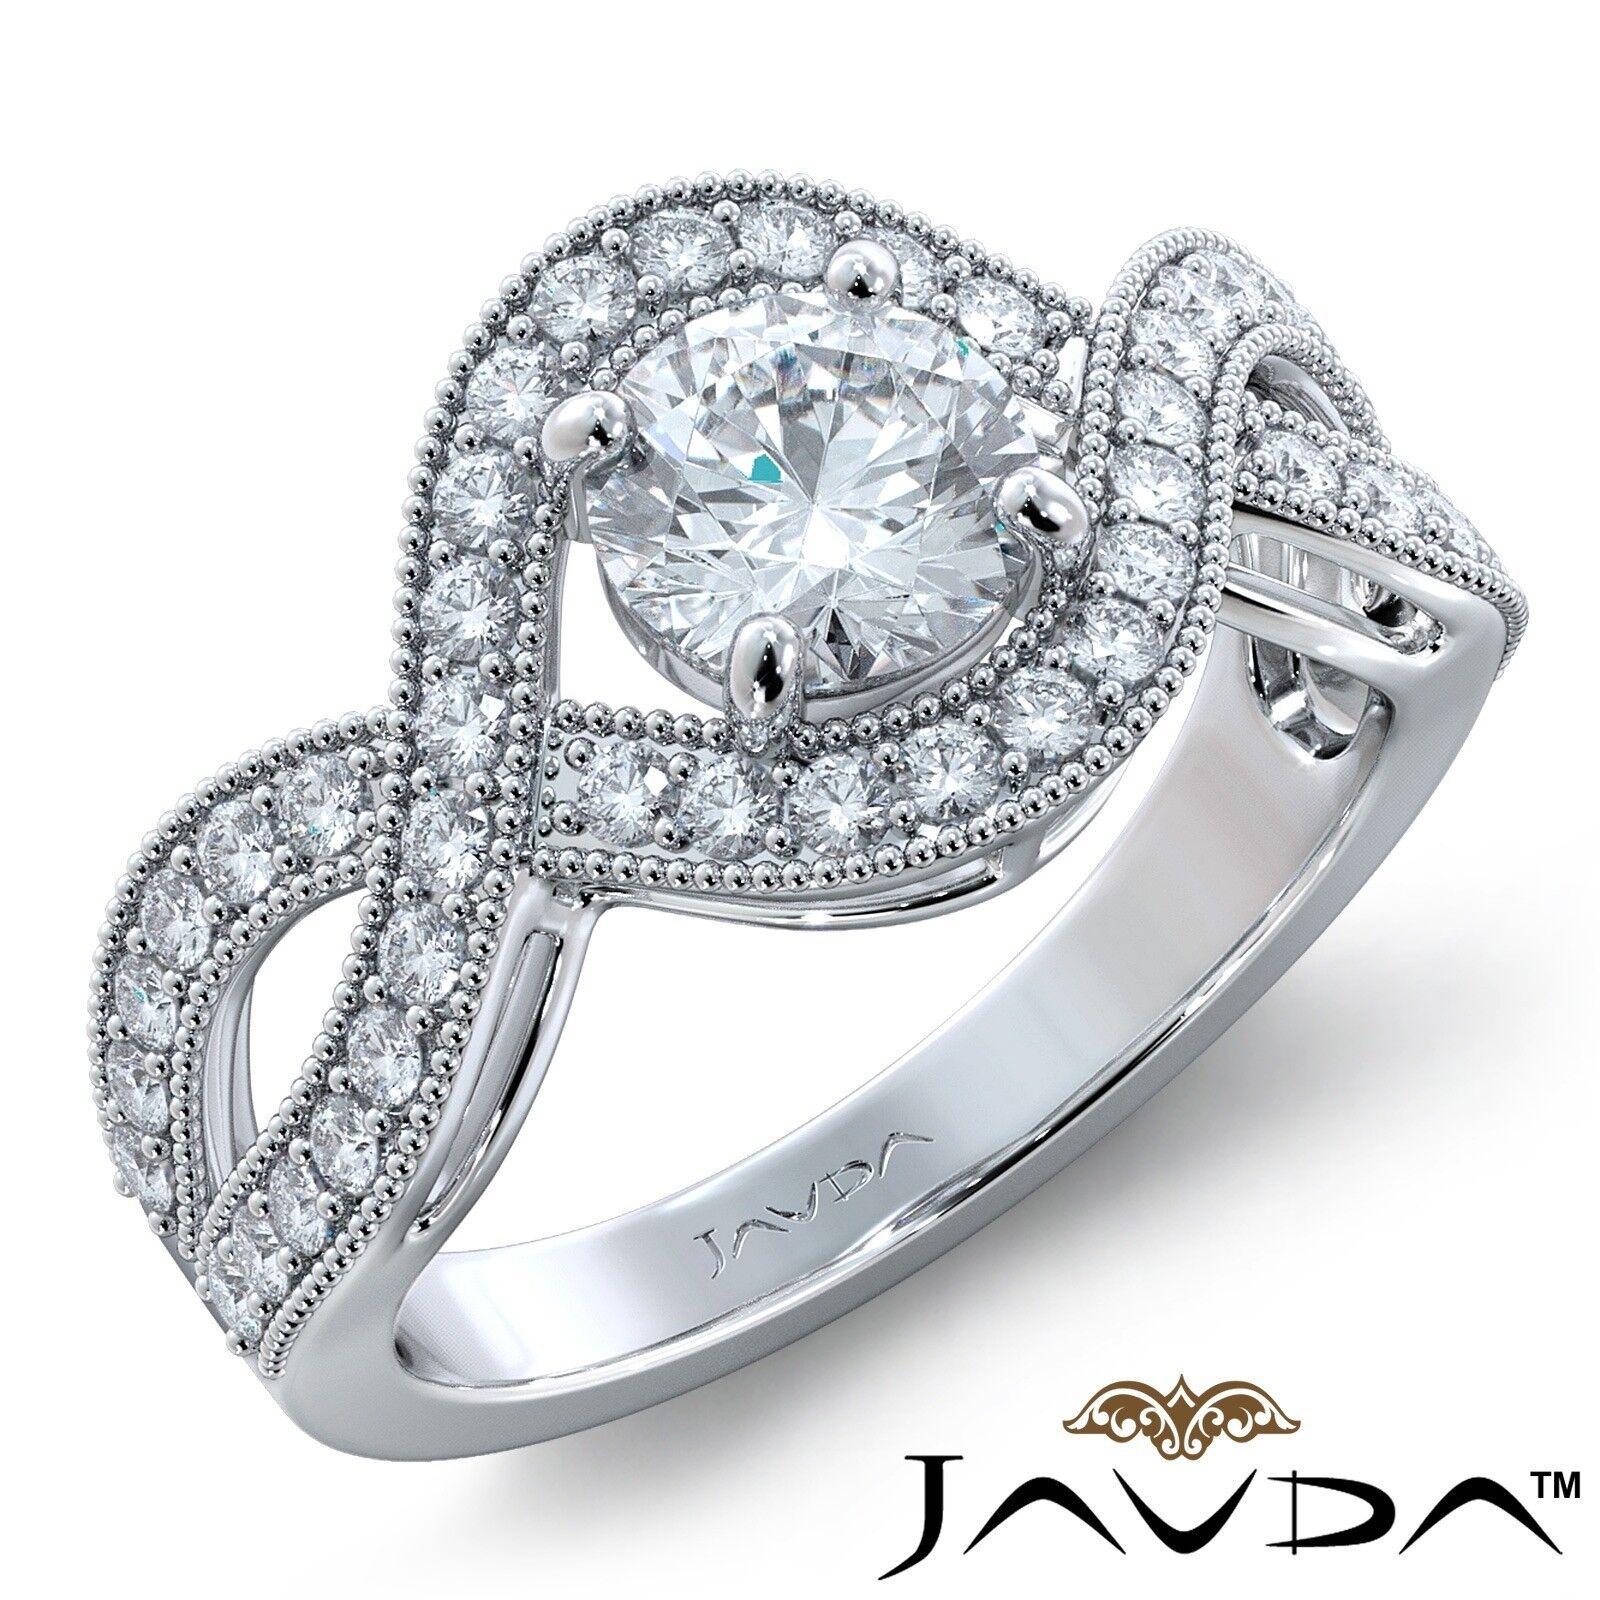 1.15ctw Milgrain Halo Side Stone Round Diamond Engagement Ring GIA F-VVS2 W Gold